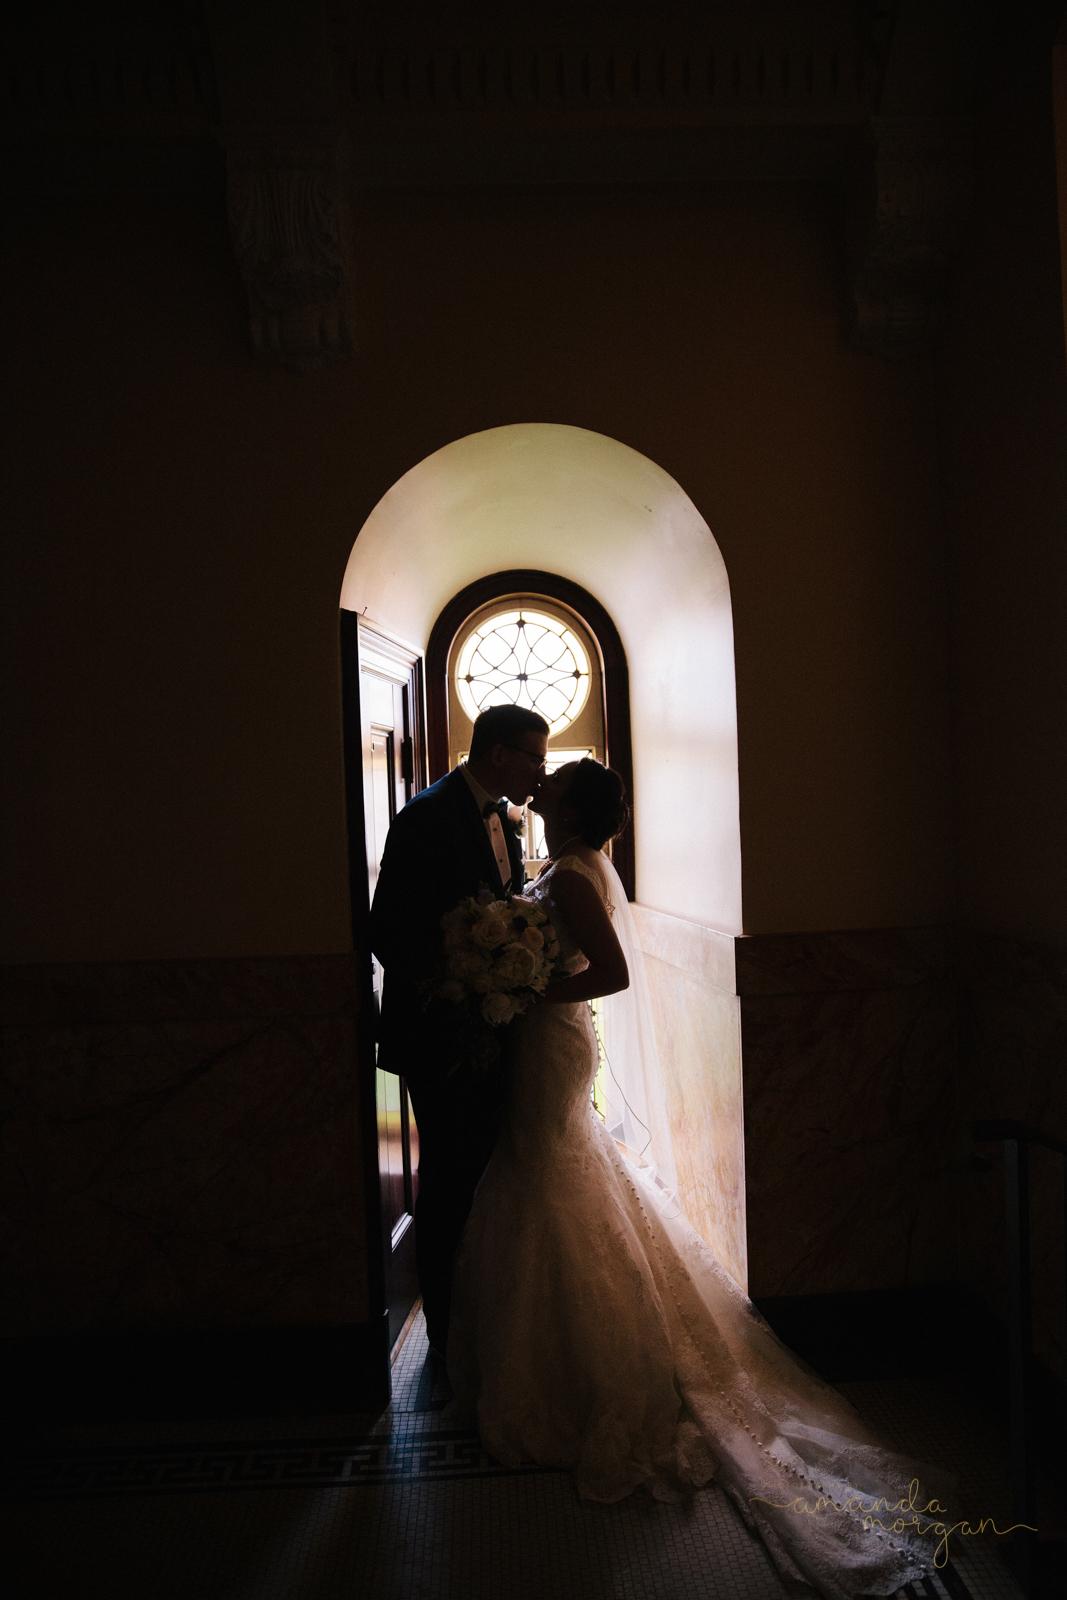 Notre-Dame-Catholic-Church-Wedding-Amanda-Morgan-11.jpg